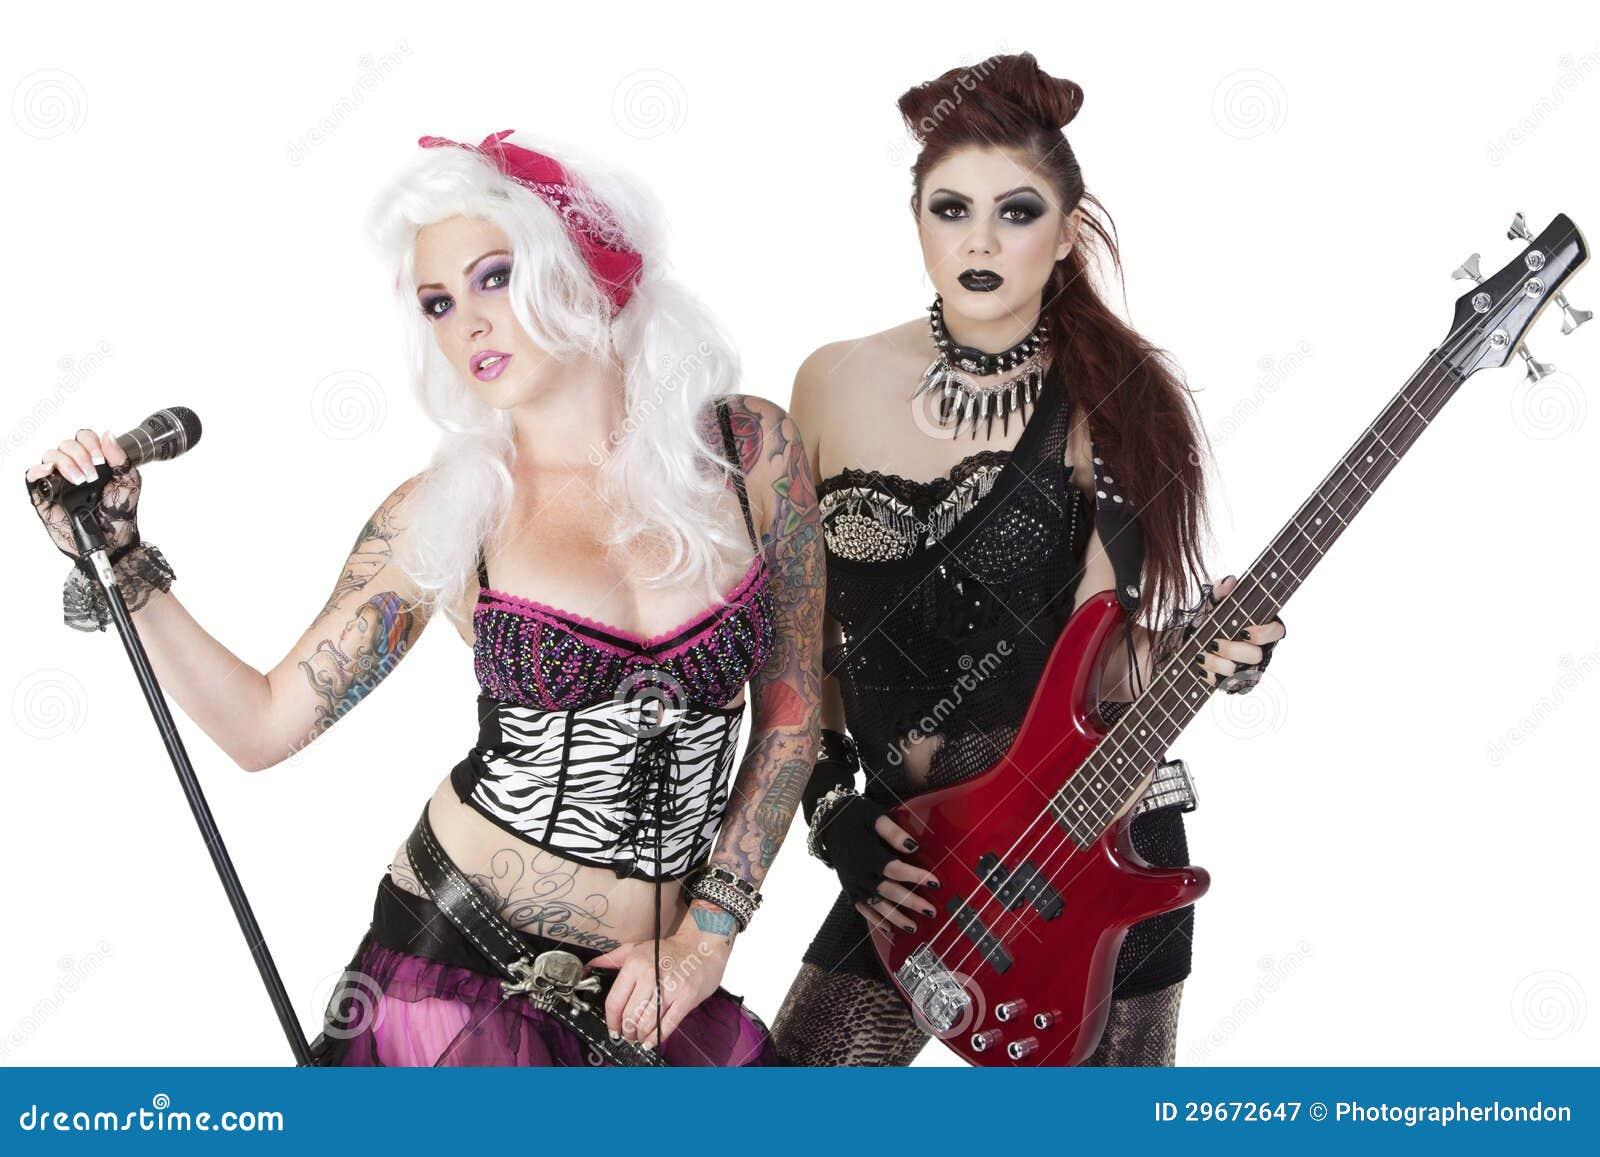 Free punk rock dating sites